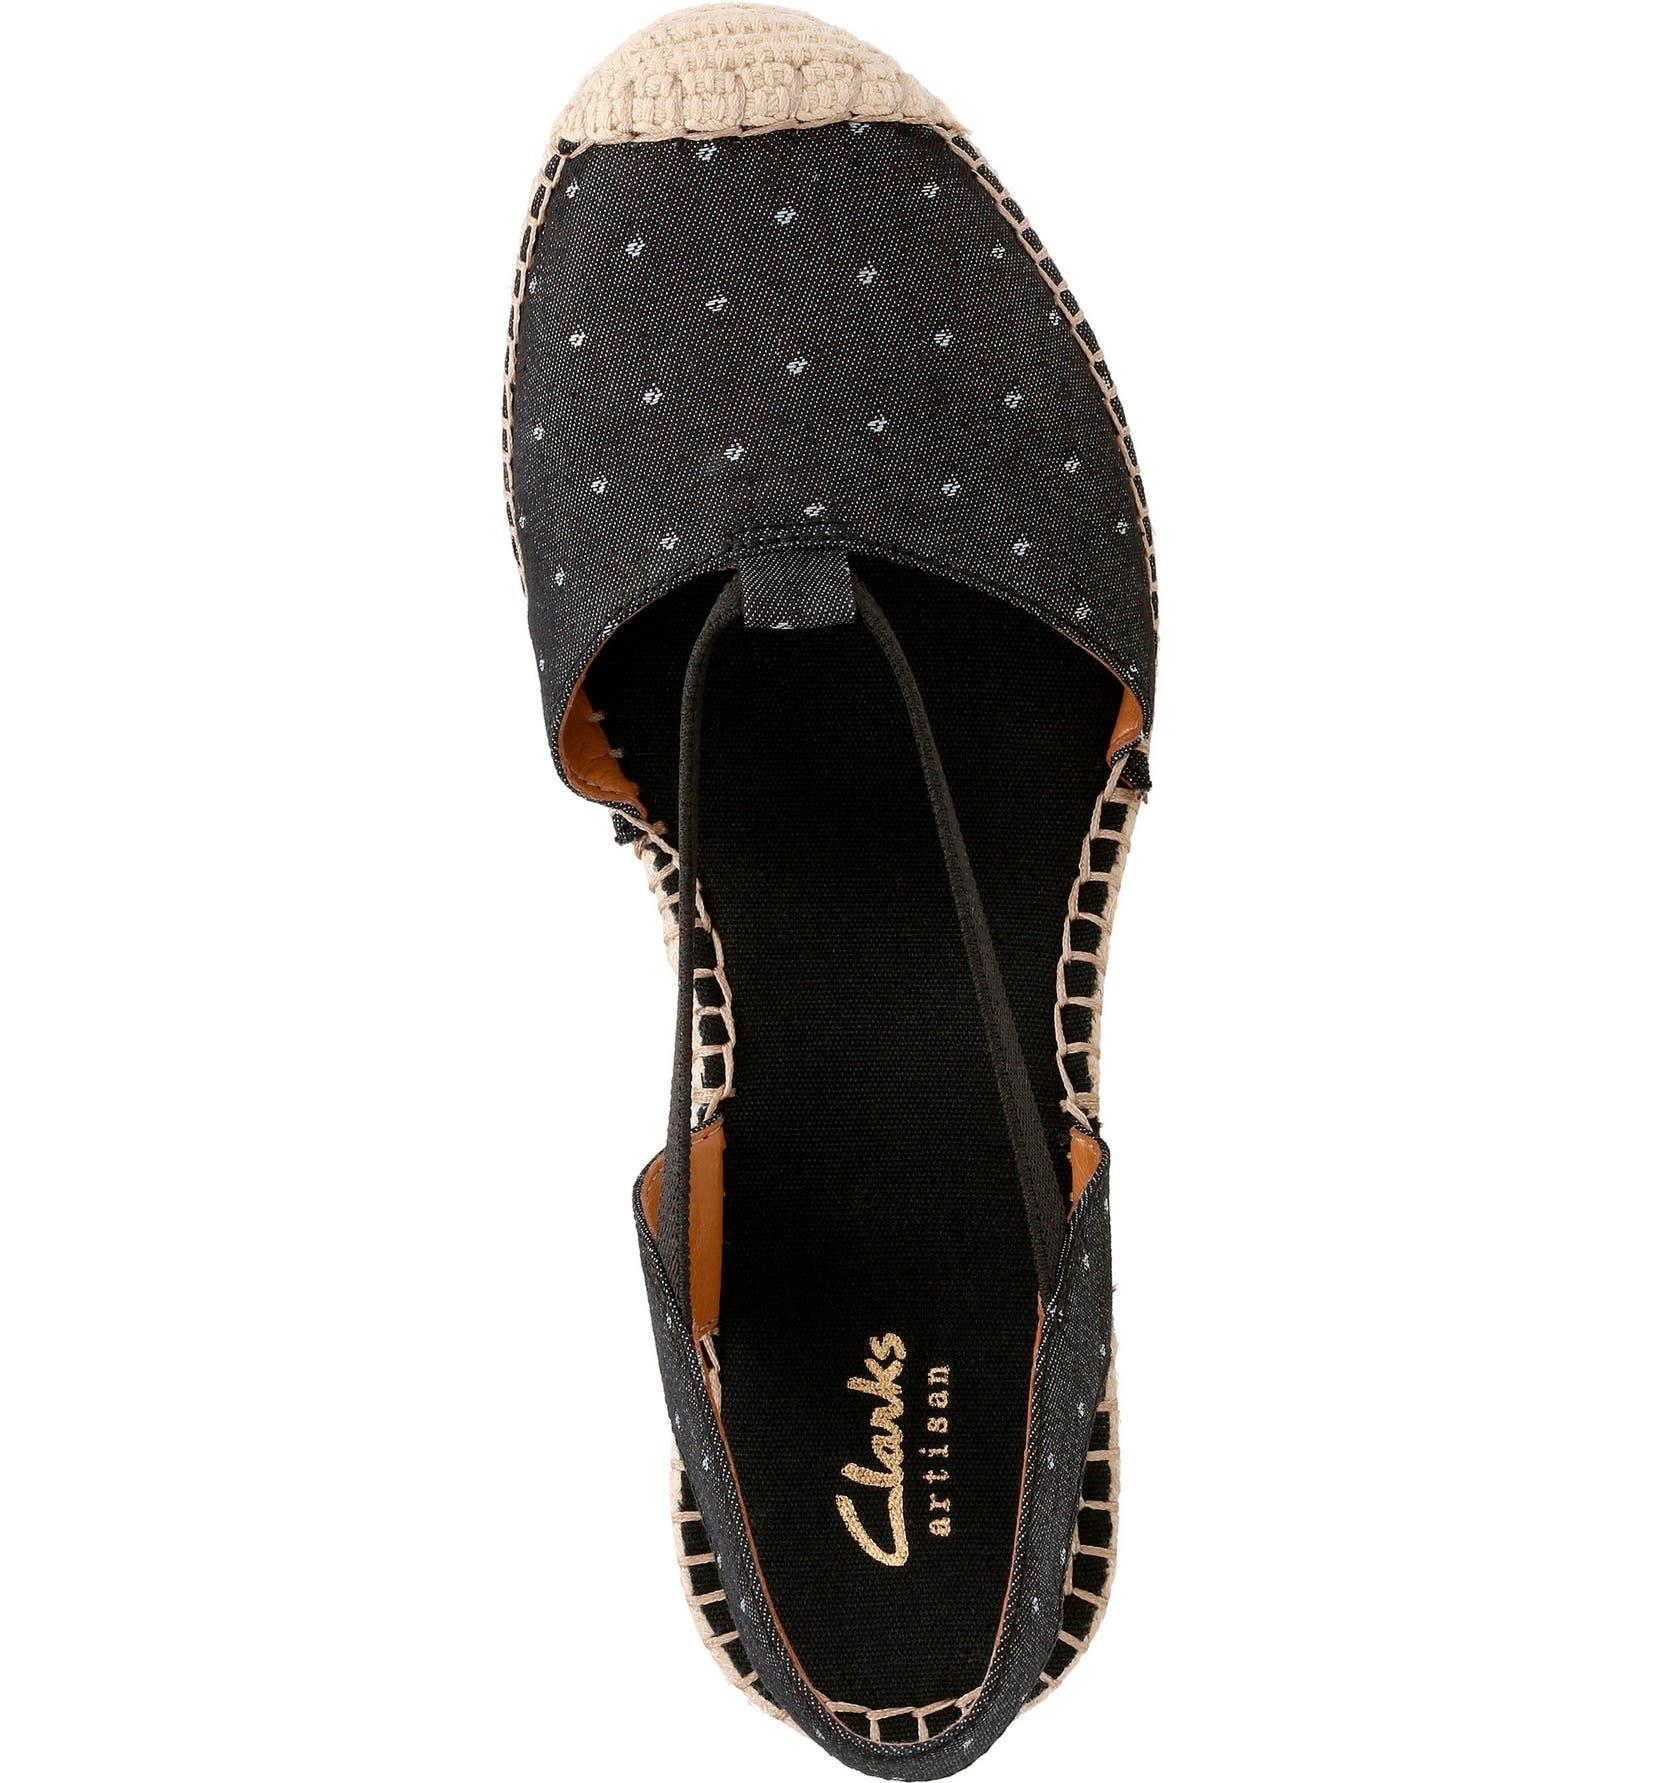 Clarks Women's Petrina Kaelie Espadrille Wedge Sandal